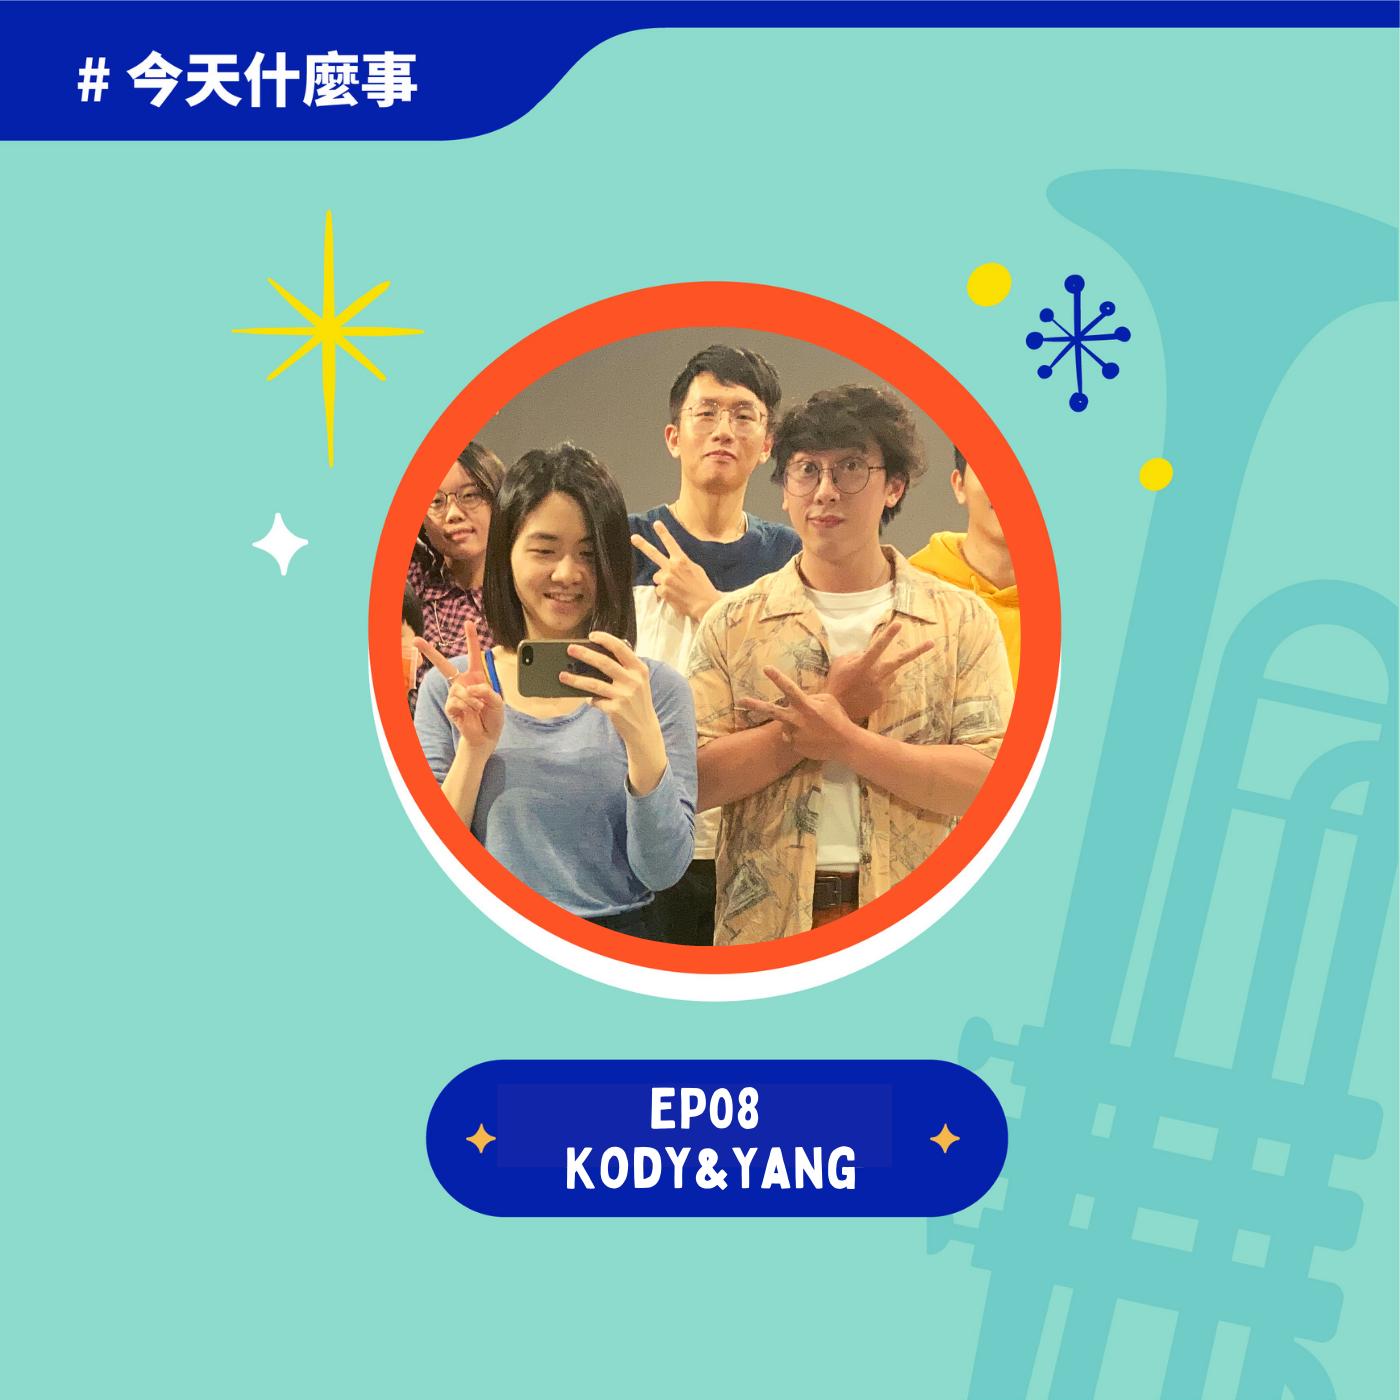 今天什麼事 EP08. ft. Kody&Yang|從場邊冷板凳到教室中的老師,新手老師の甘苦談!